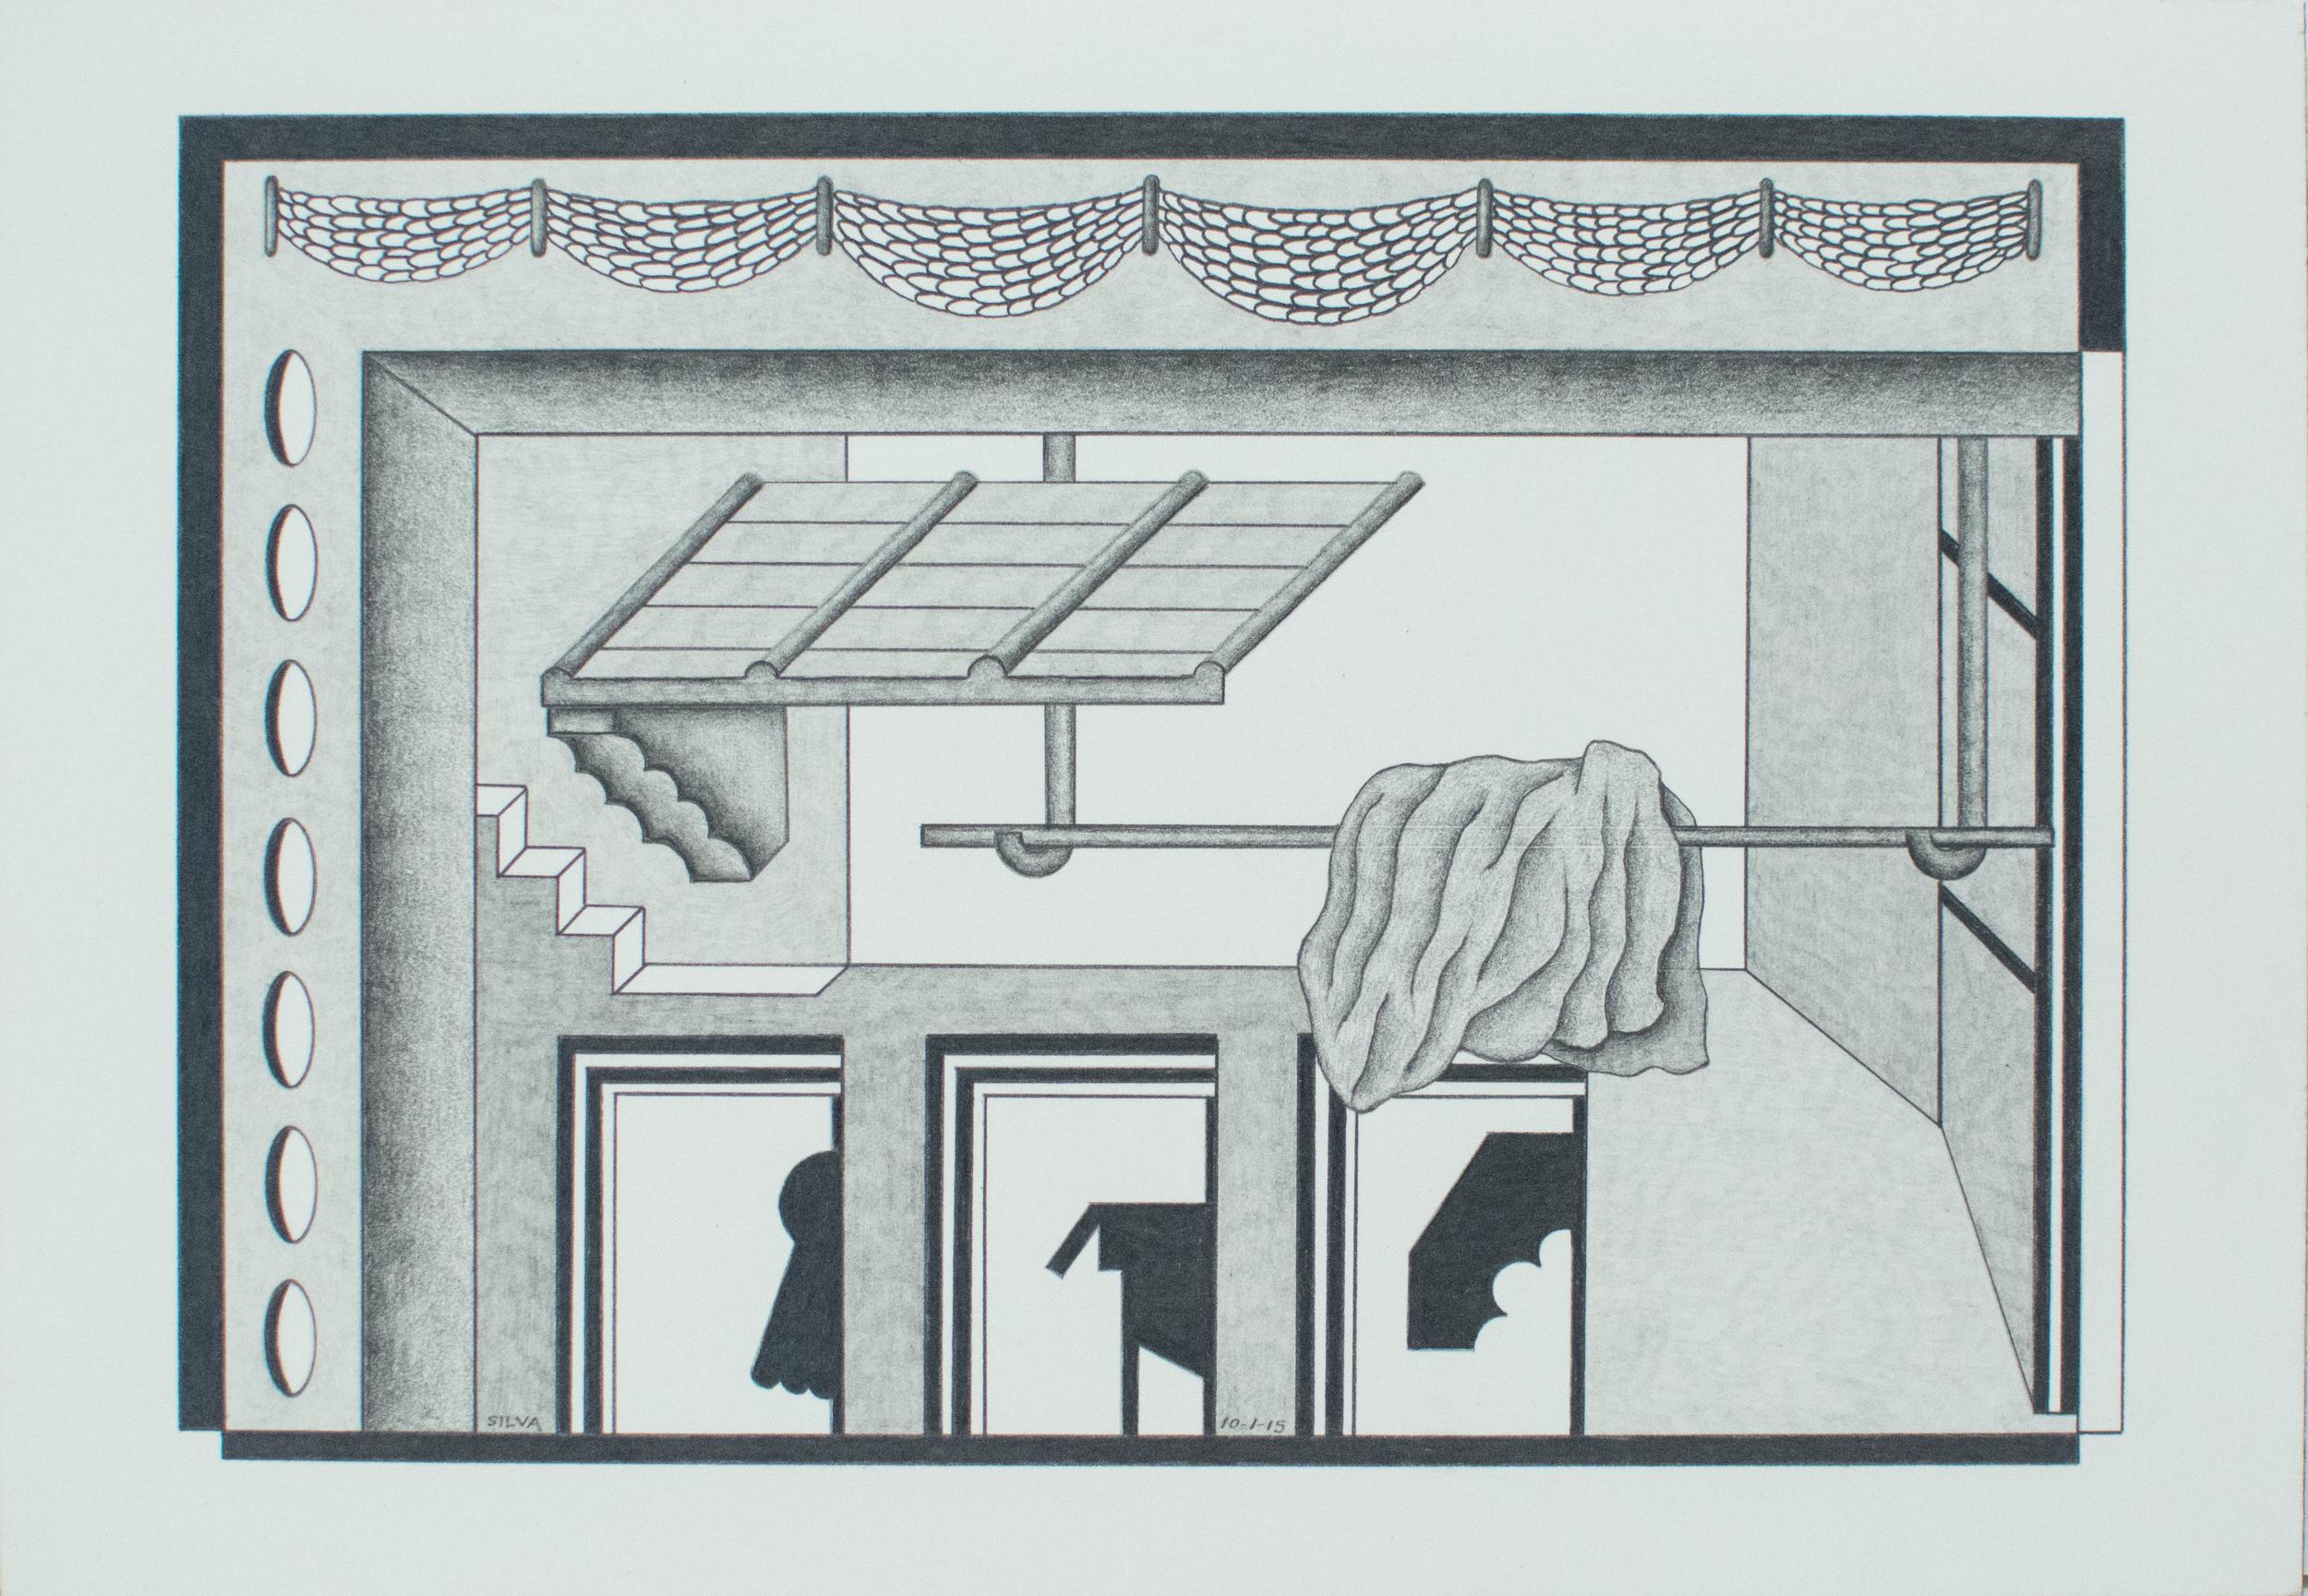 10-1-15, 2015, Graphite on paper, 7 x 10 inches